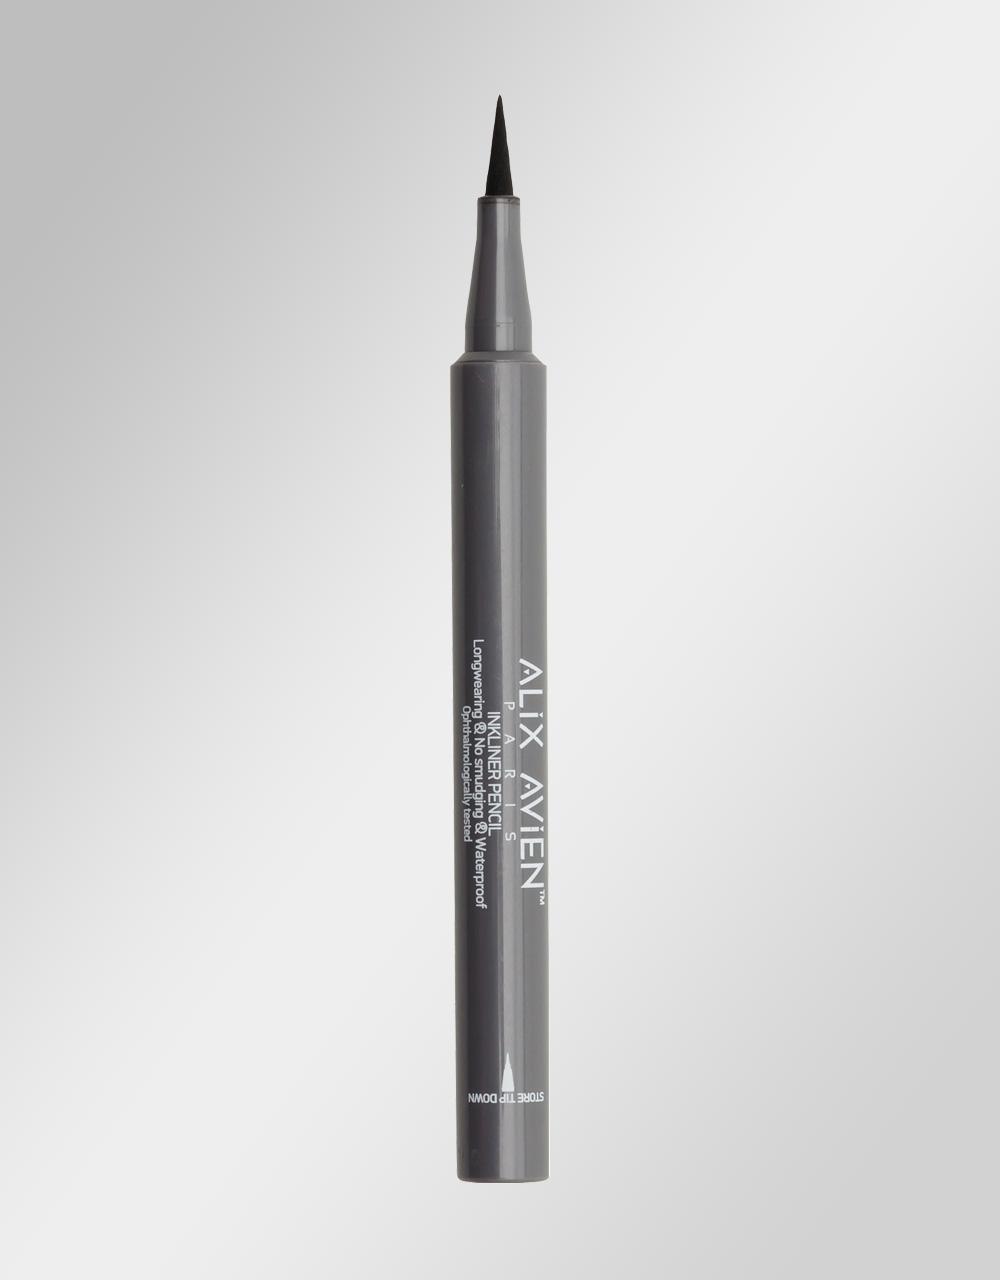 Inkliner-Pencil